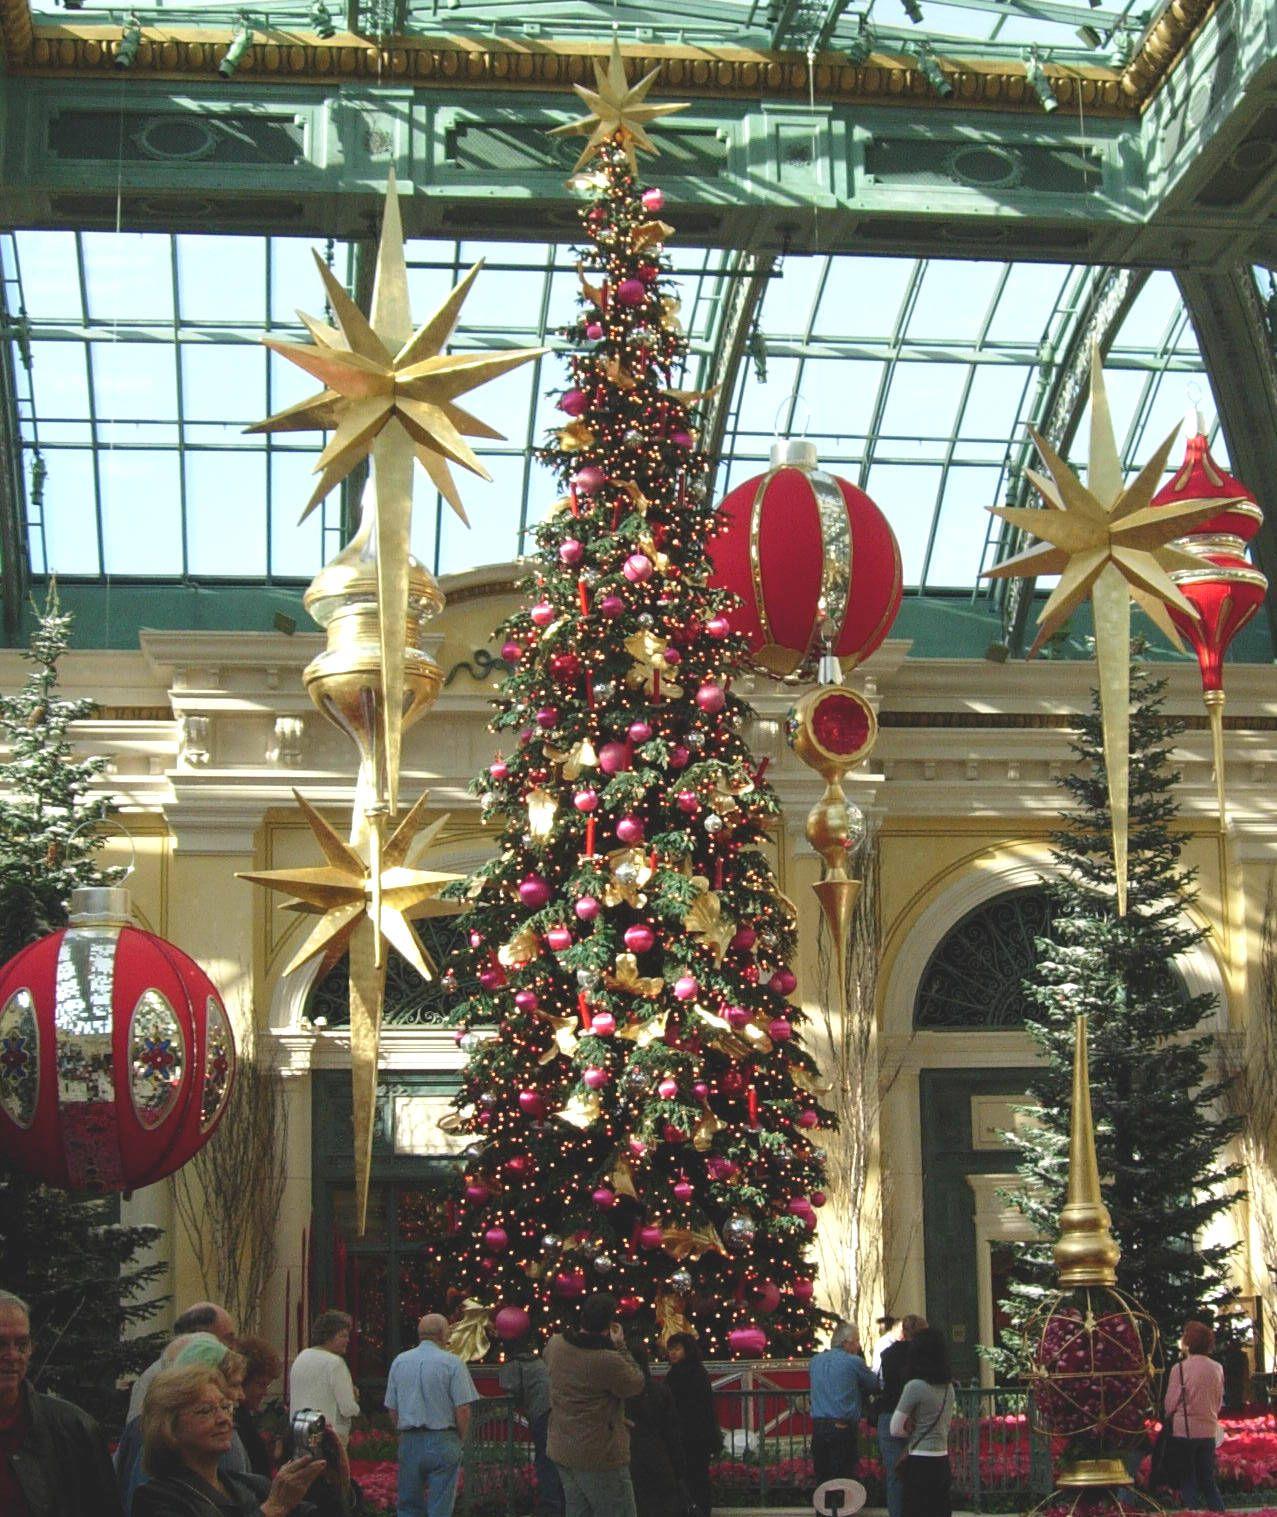 Bellagio Las Vegas Christmas Decorations   Psoriasisguru.com